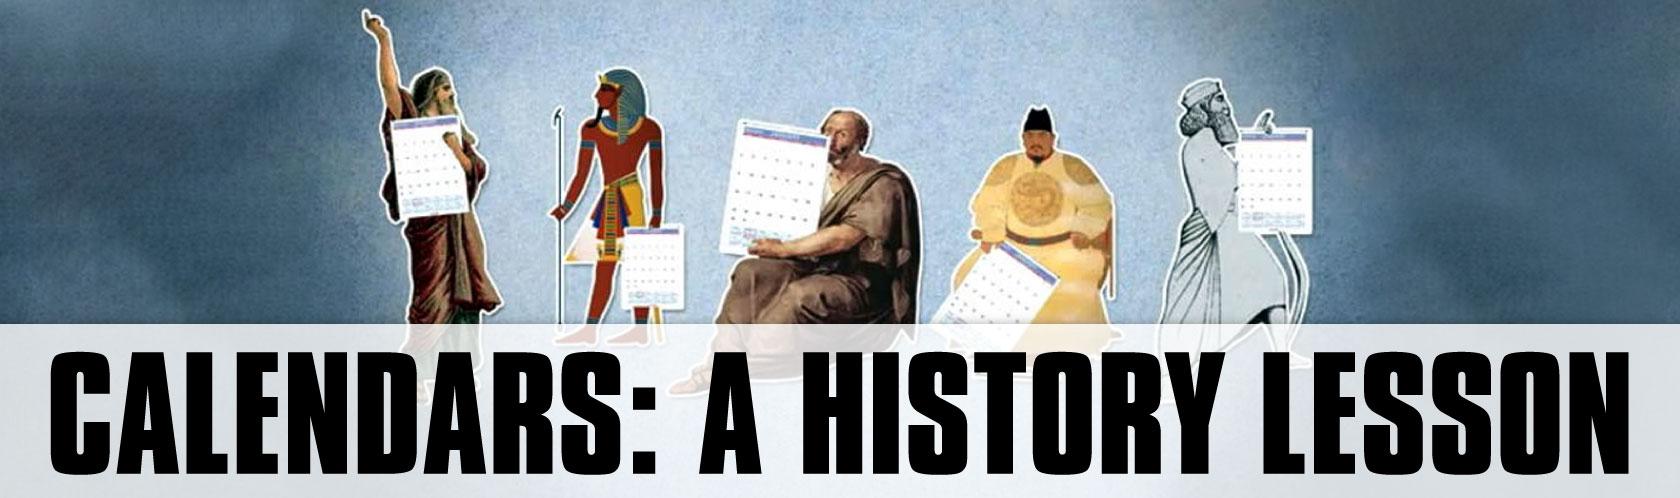 Calendars: A History Lesson